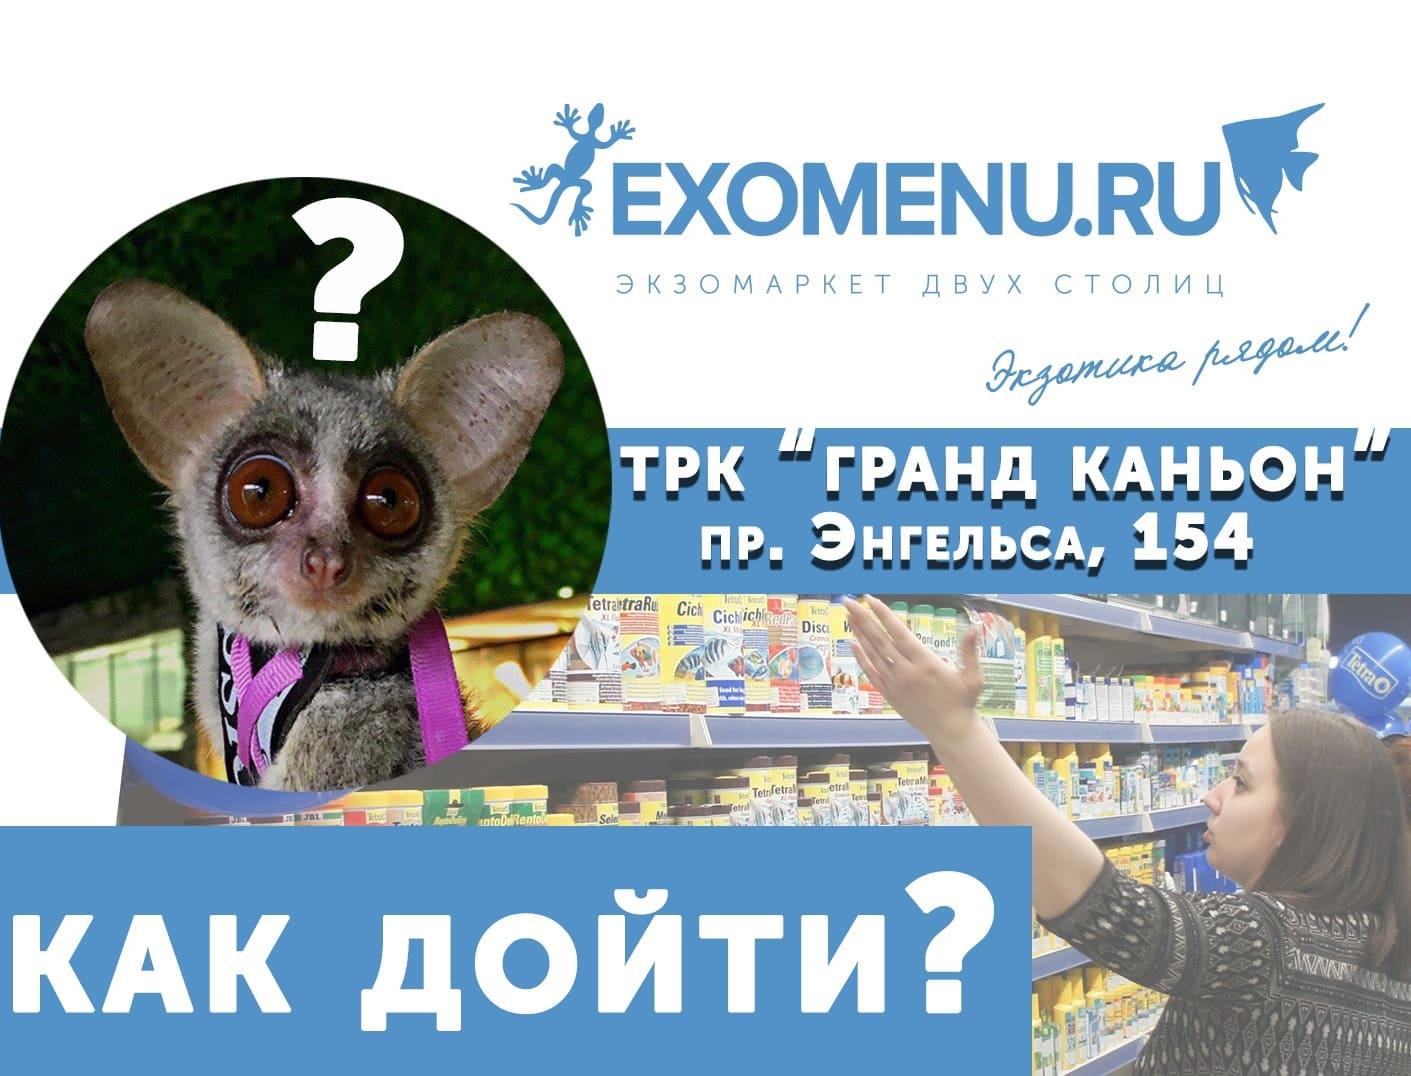 Как найти магазин EXOMENU в Гранд Каньоне?